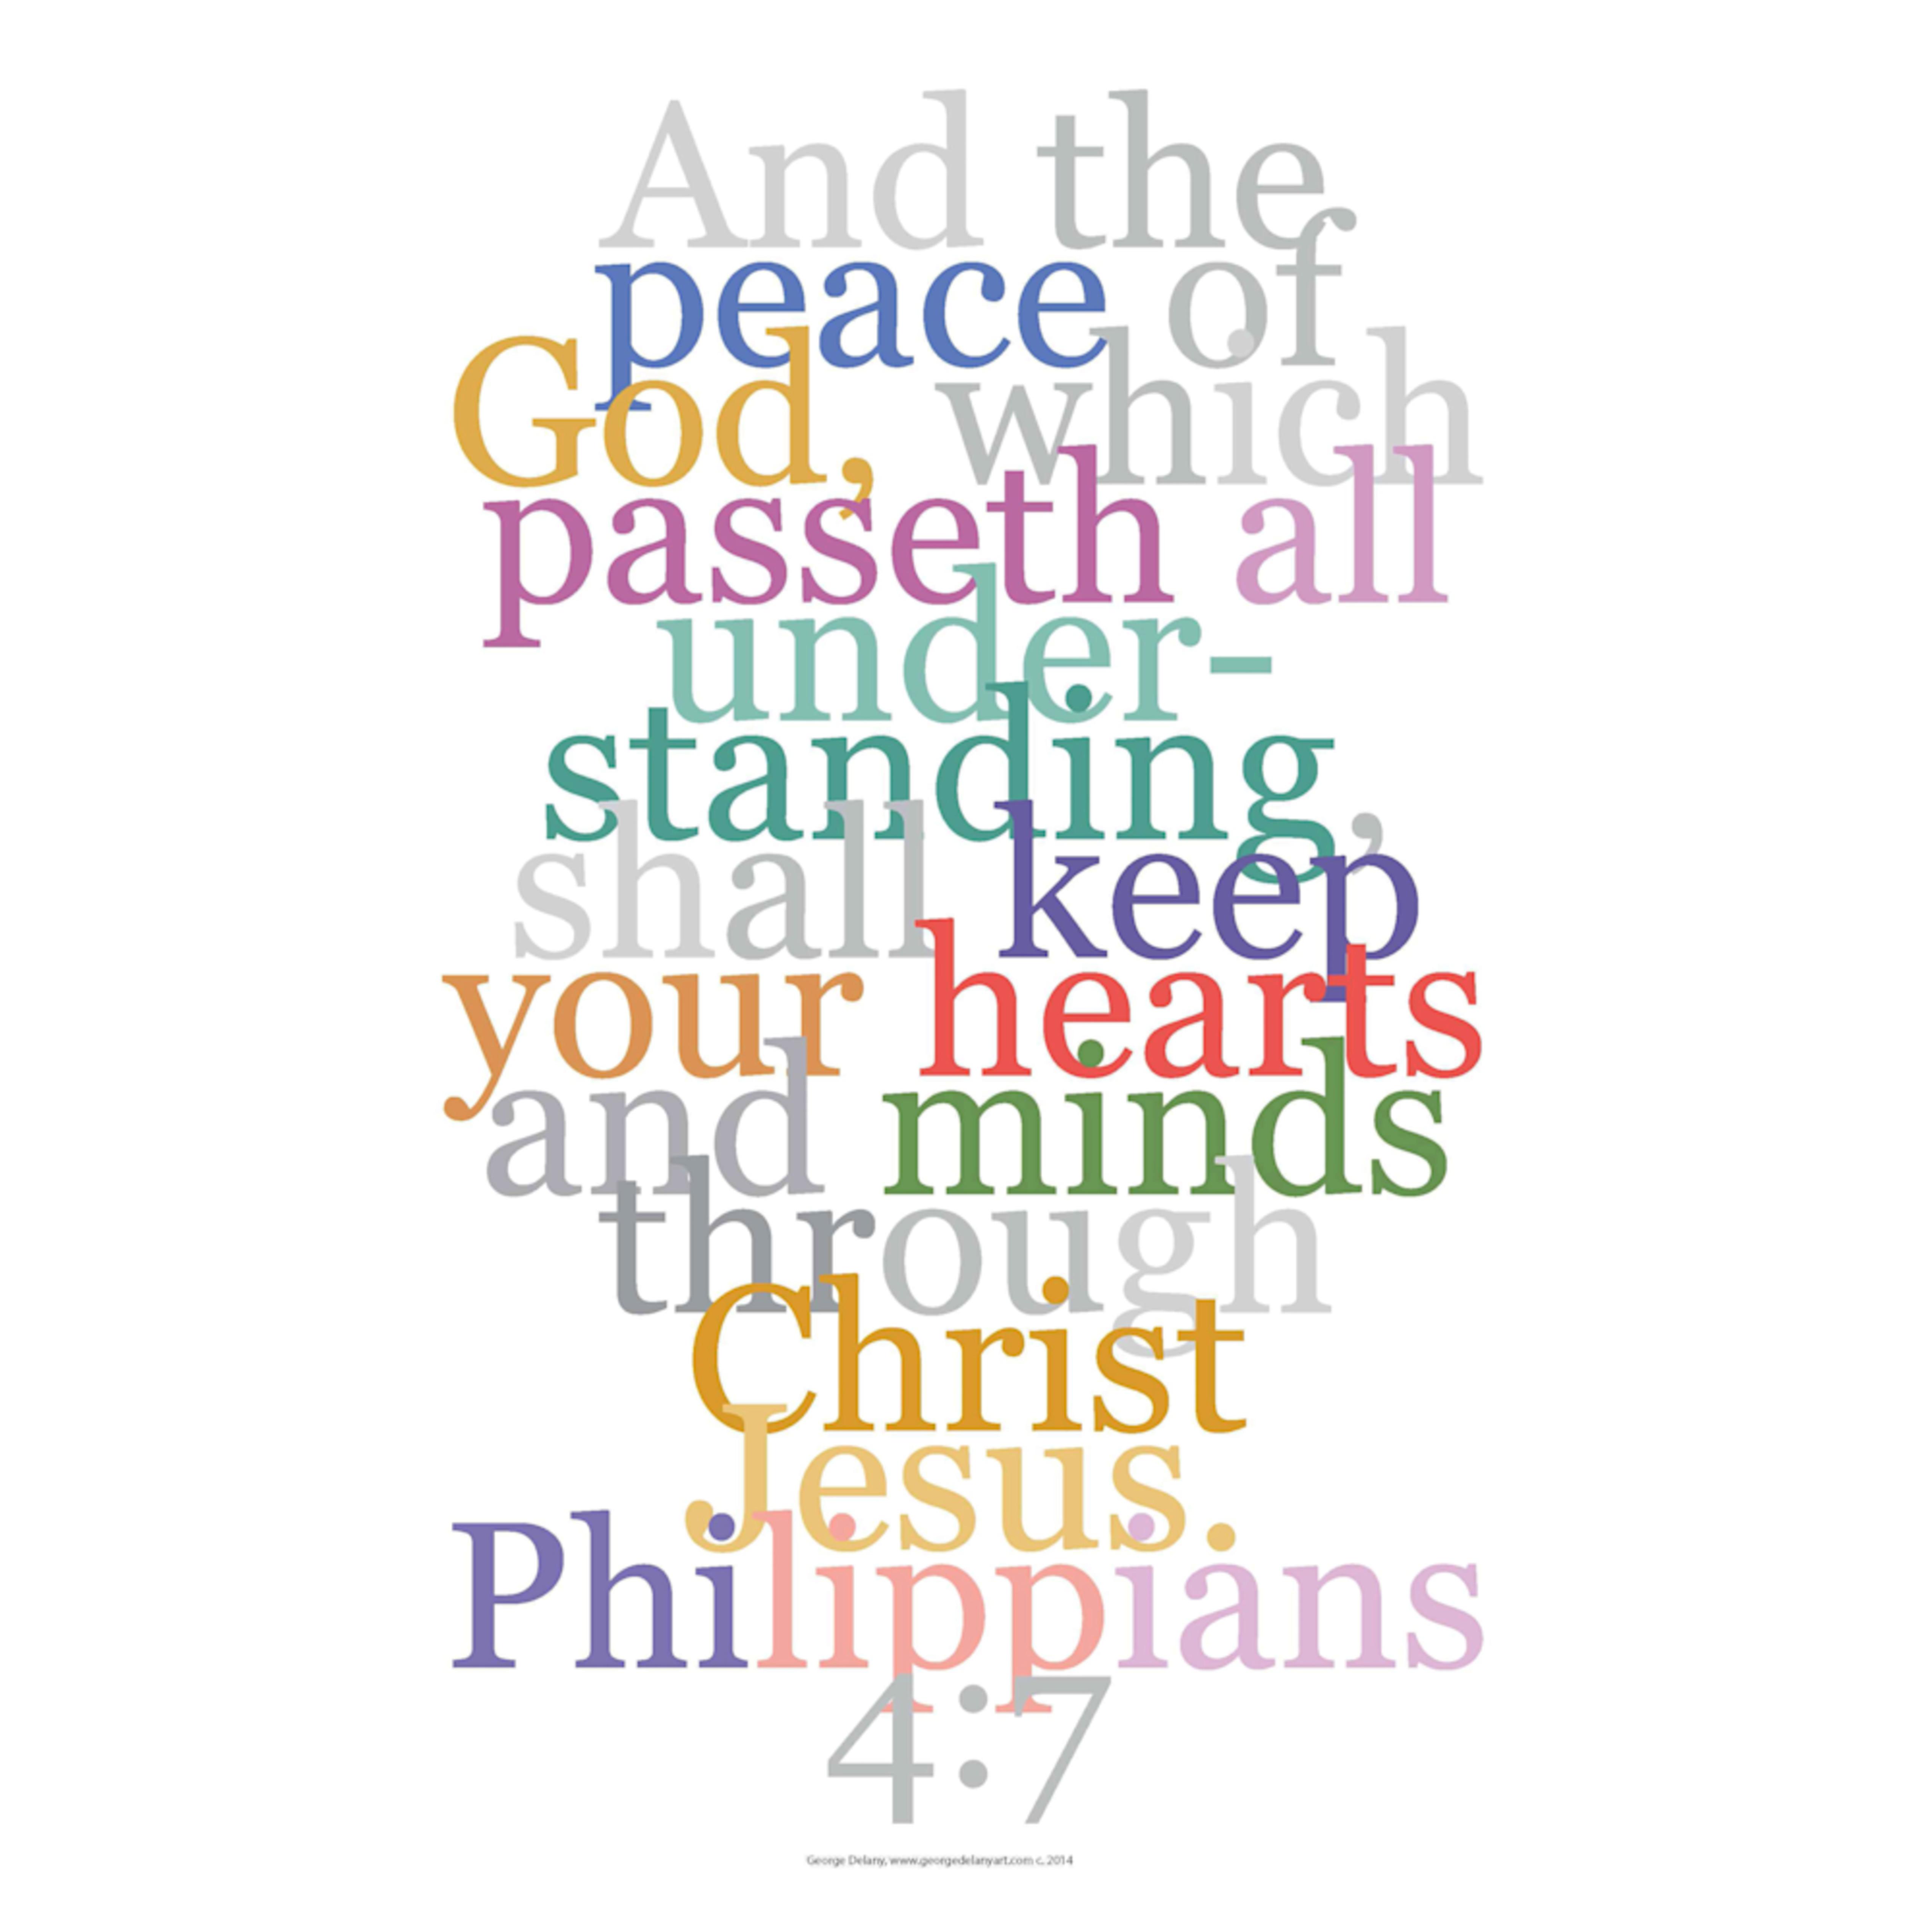 21 philippians4 7 nnehm4